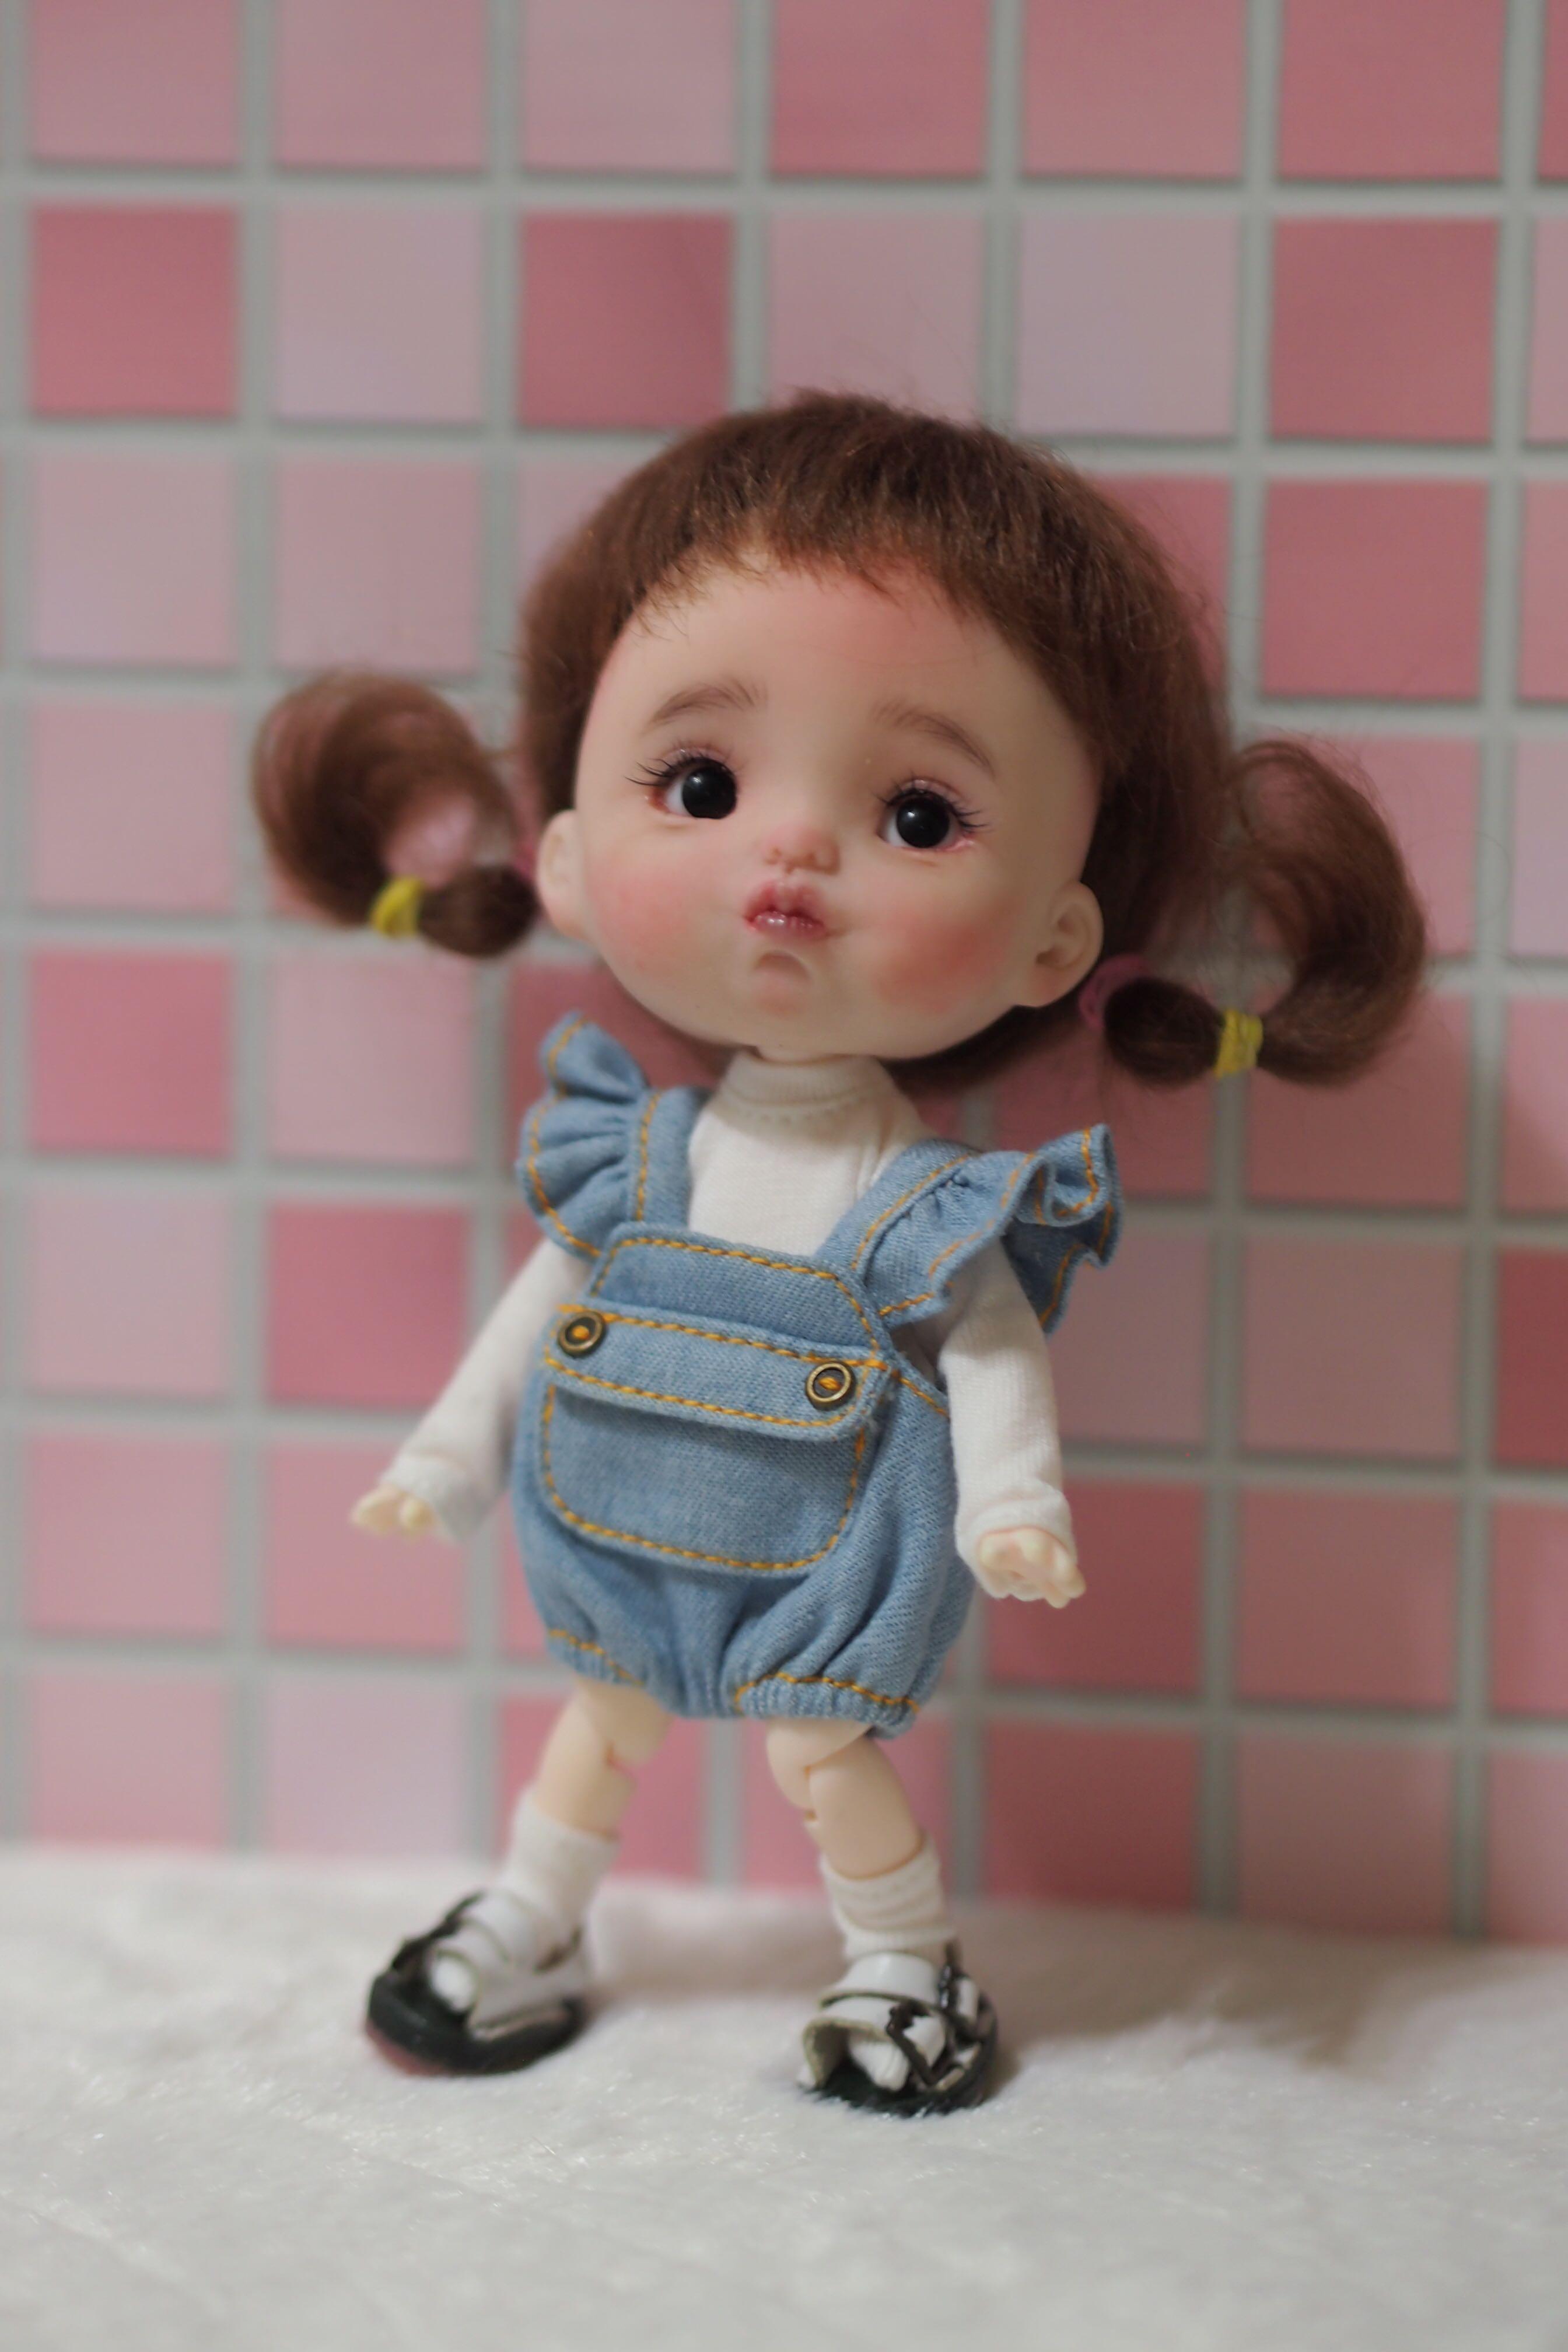 OB11 娃頭 整娃 比利時軟陶 Doll 黏土娃娃 黏土頭 關節娃娃 (二手)可愛 嘟嘟嘴 寶寶